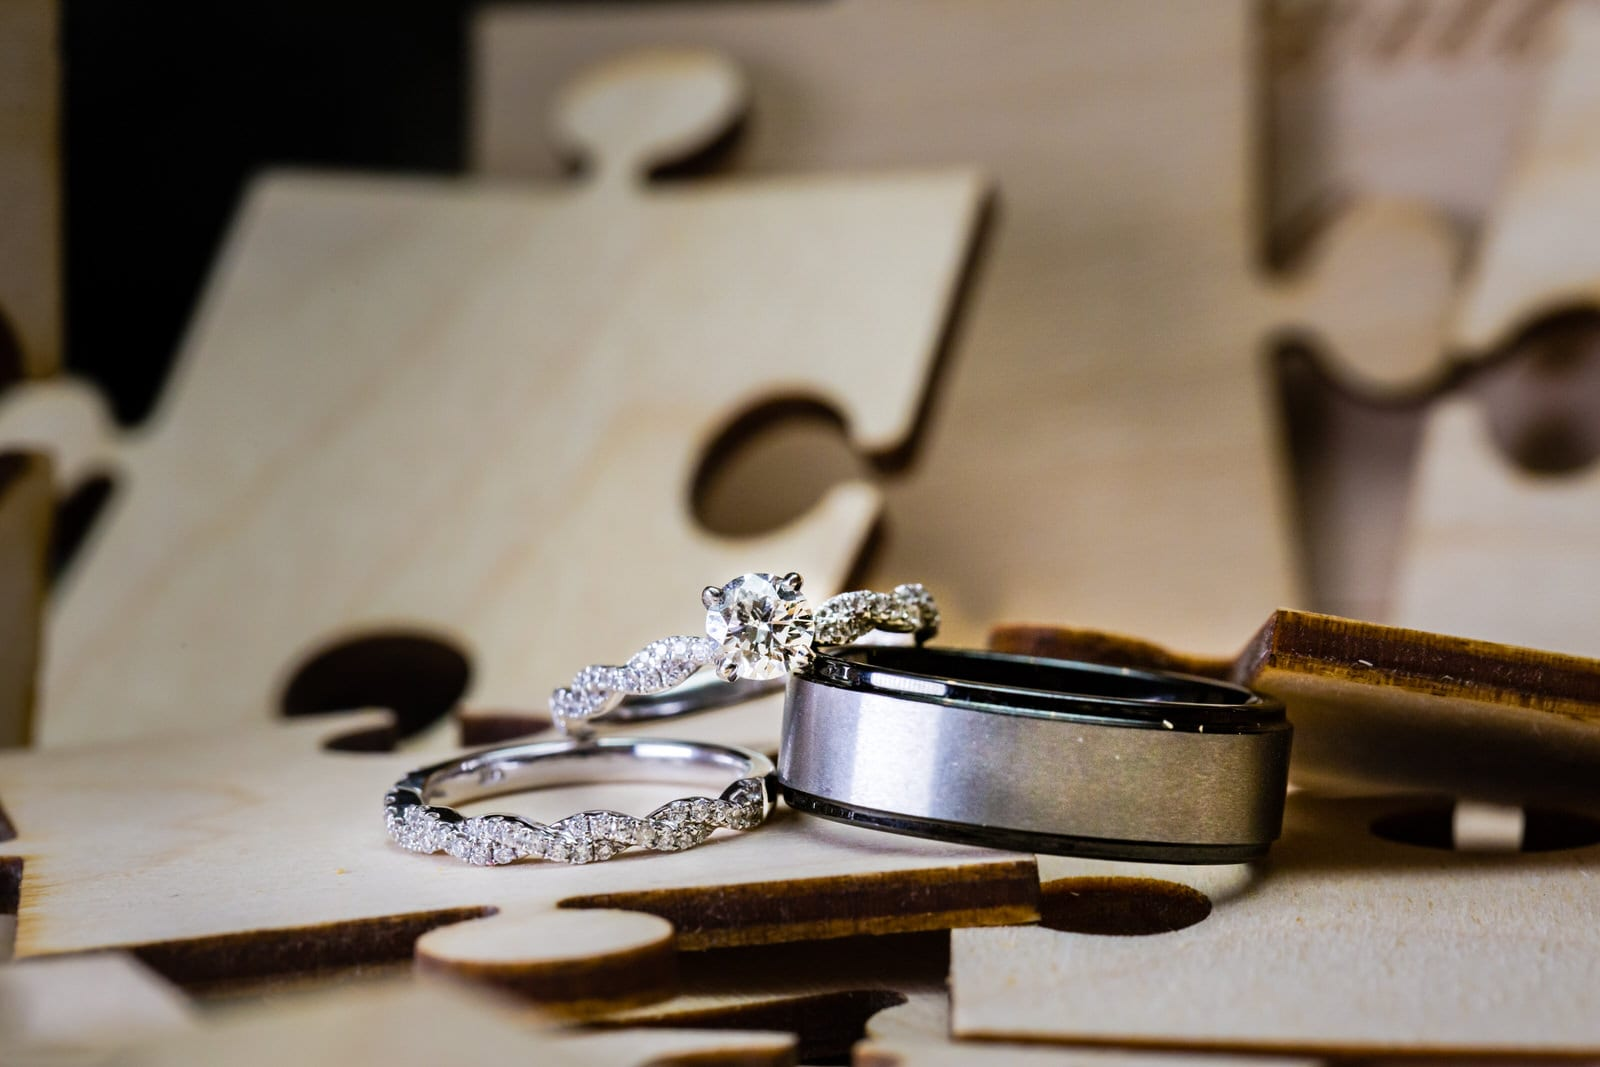 Hawaii-Wedding-Photographer-Ring-Details-Engagement-Ring-Off-camera-flash-macro-10.jpg